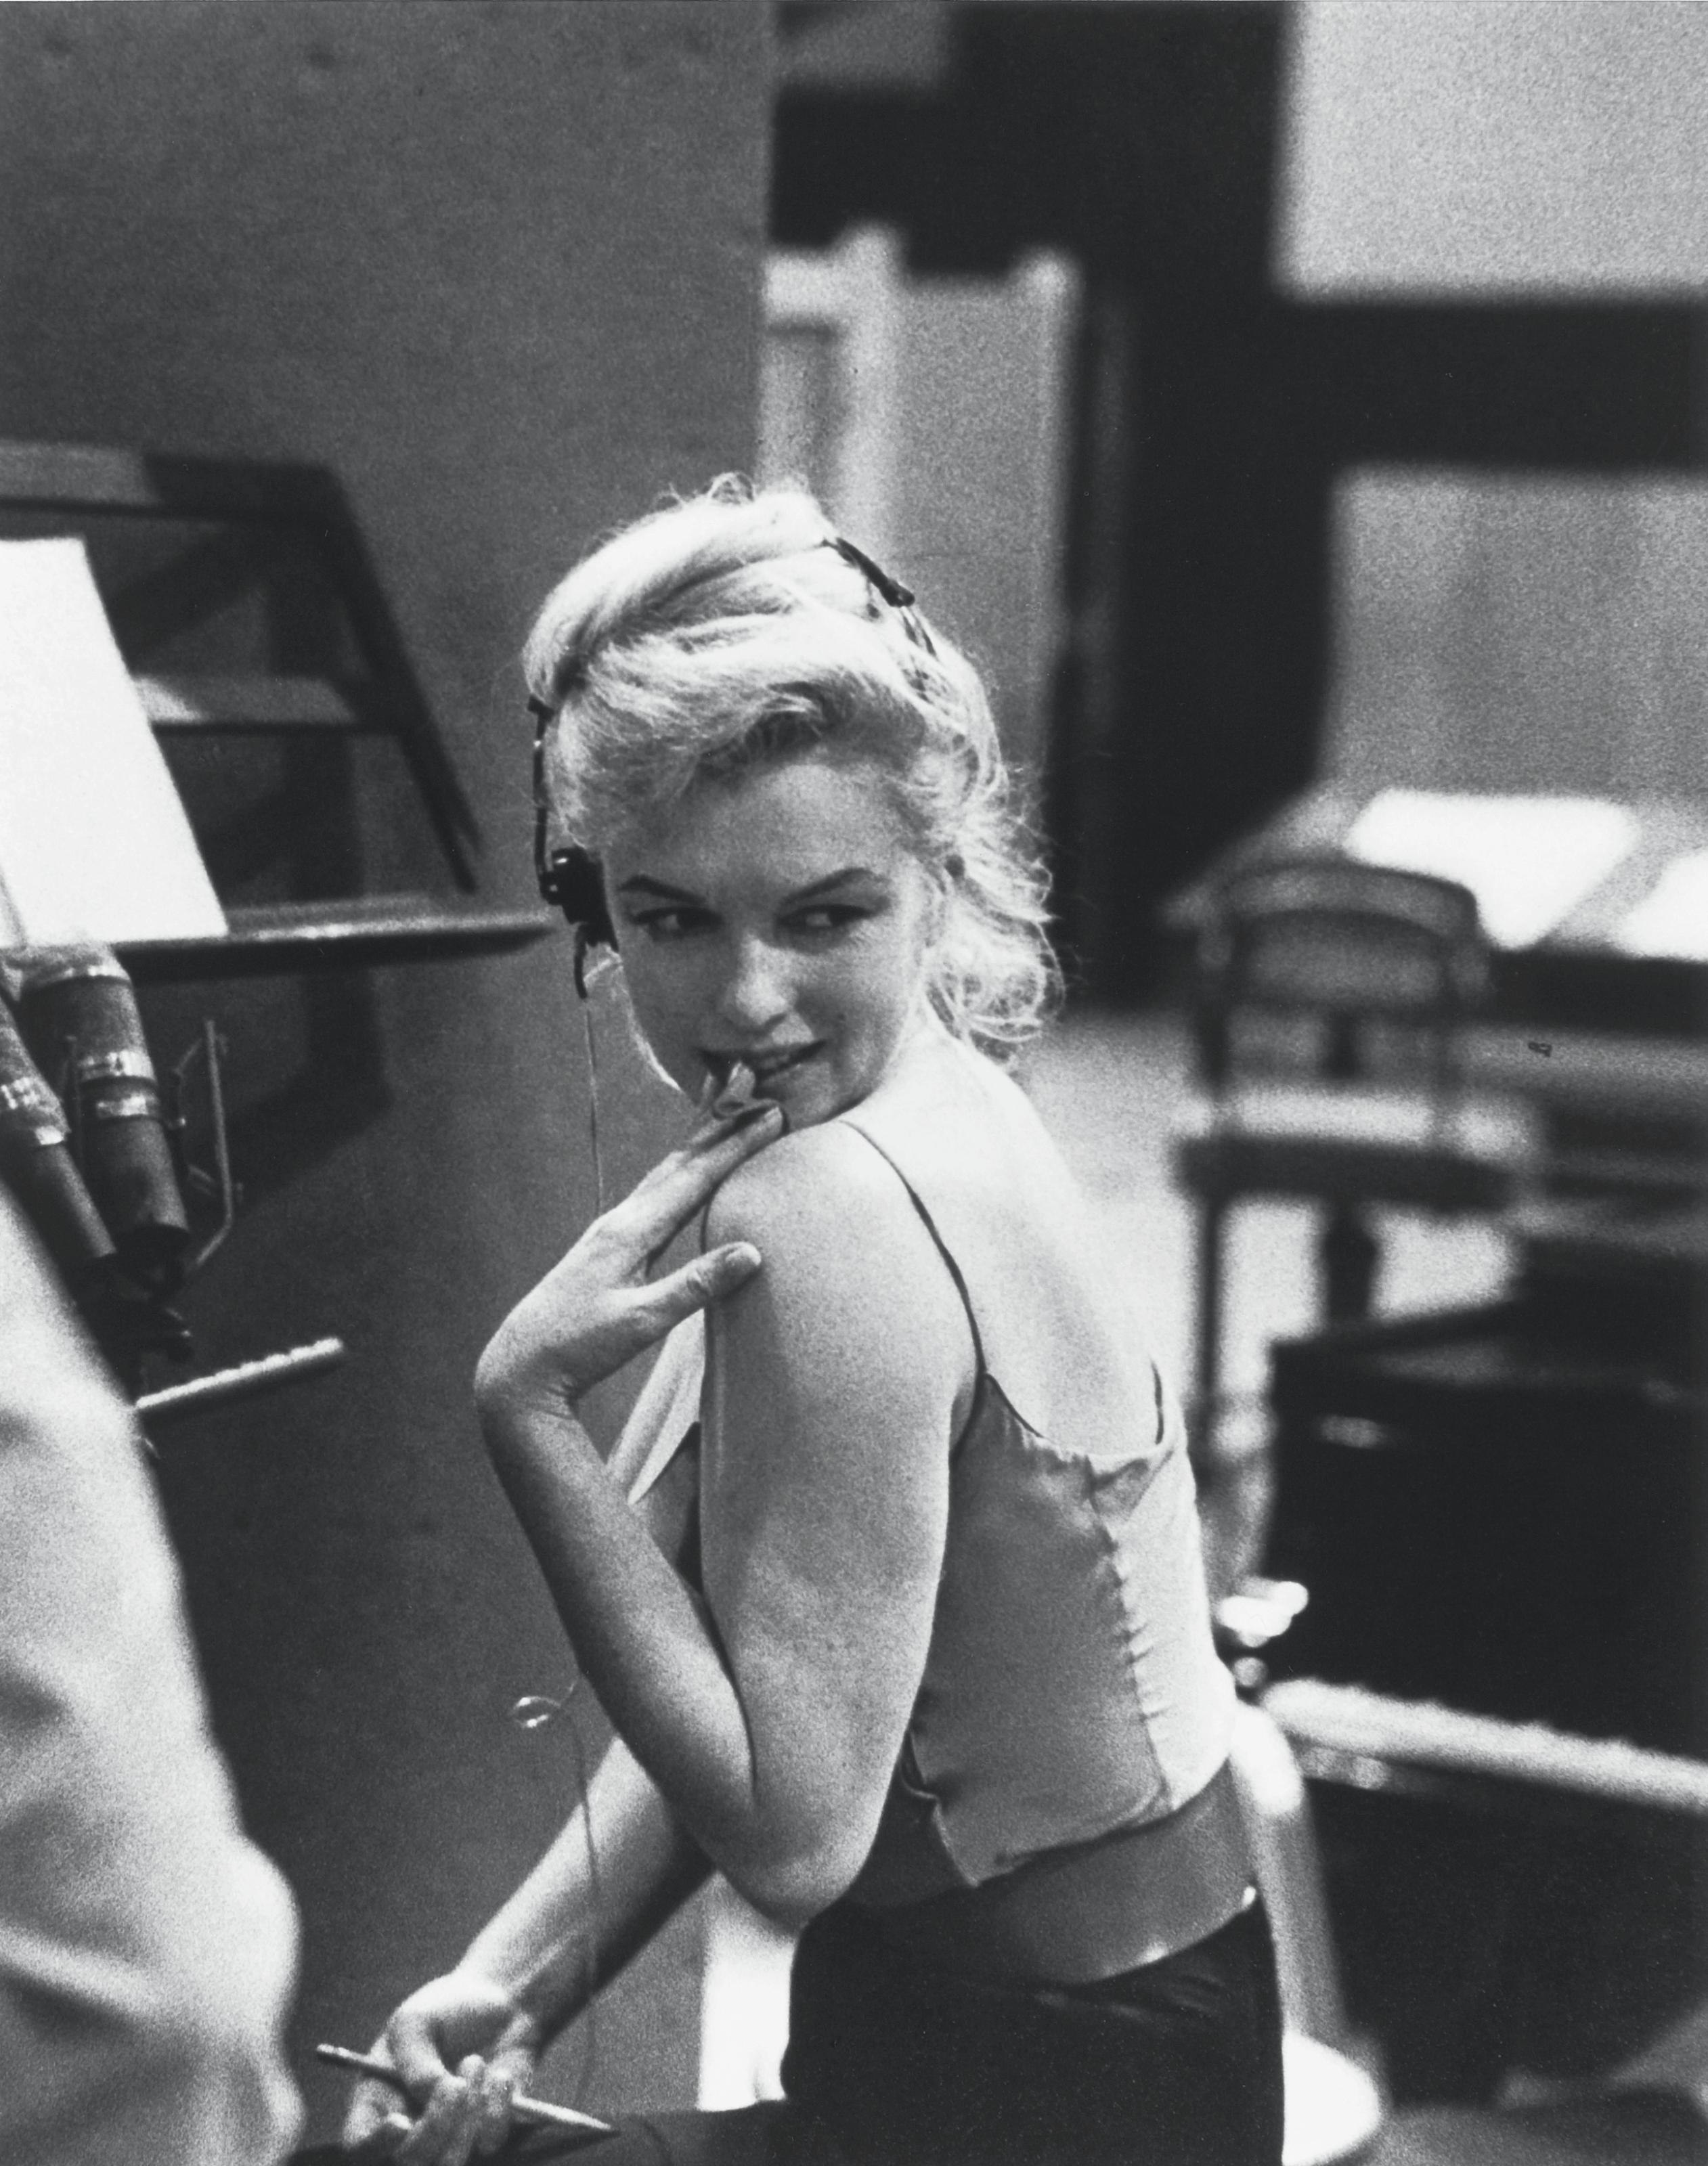 Marilyn Monroe, 1952-1962